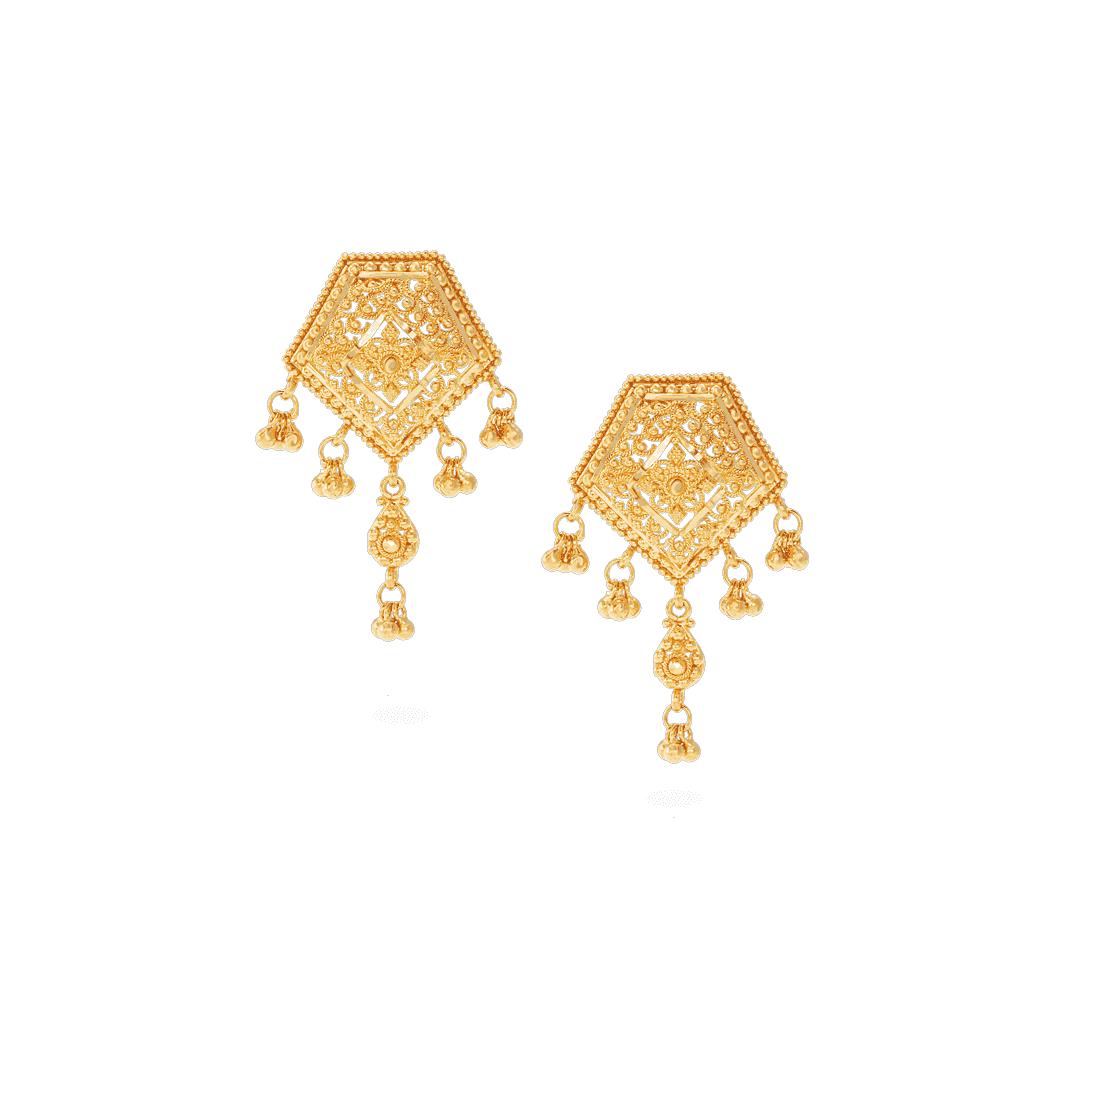 22499 - Jali 22ct Gold Filigree Earrings